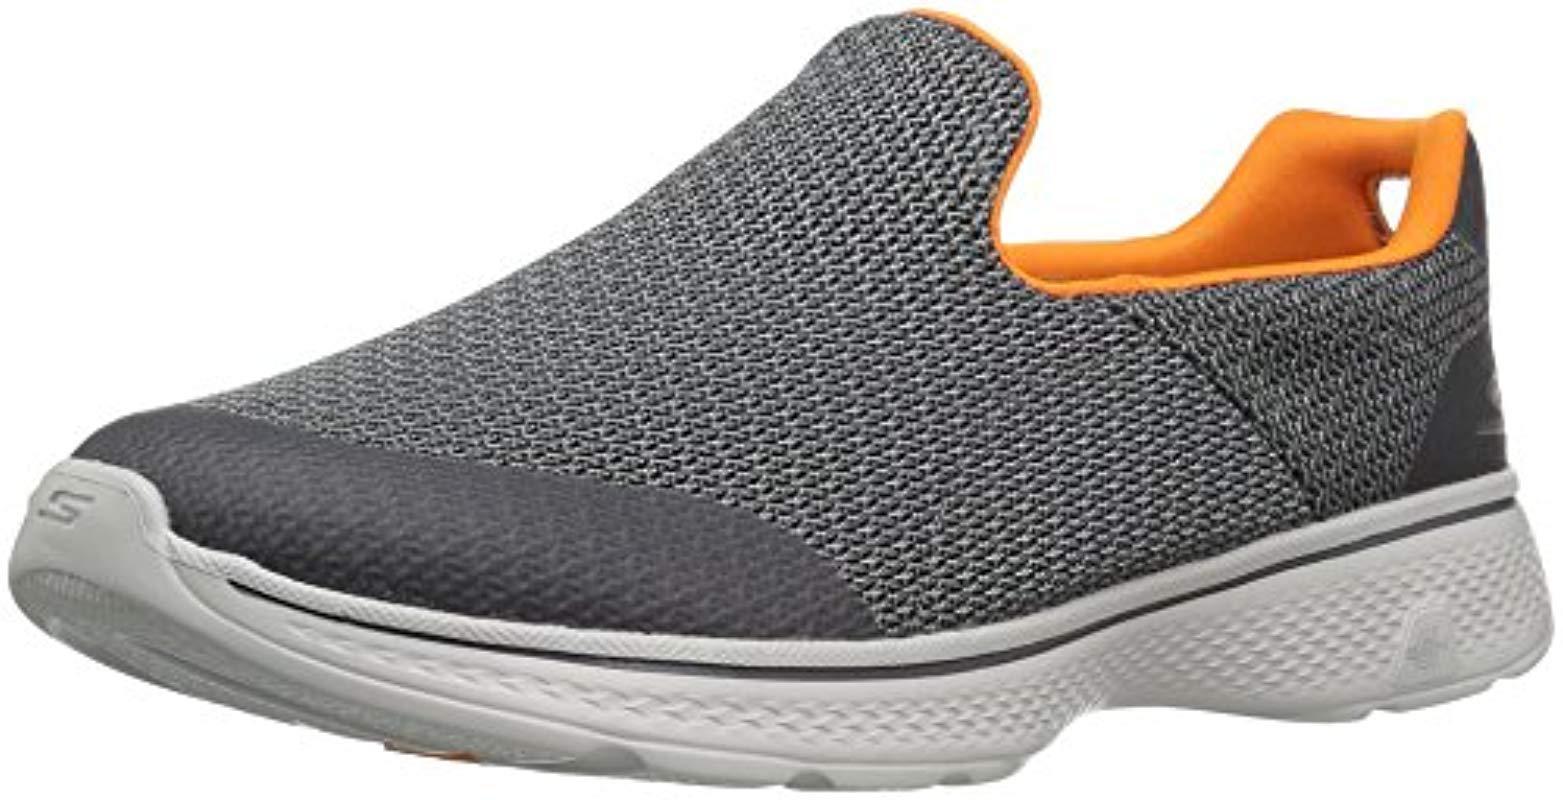 Lyst - Skechers Performance Go Walk 4 Expert Walking Shoe in Gray ... c298fc046ef